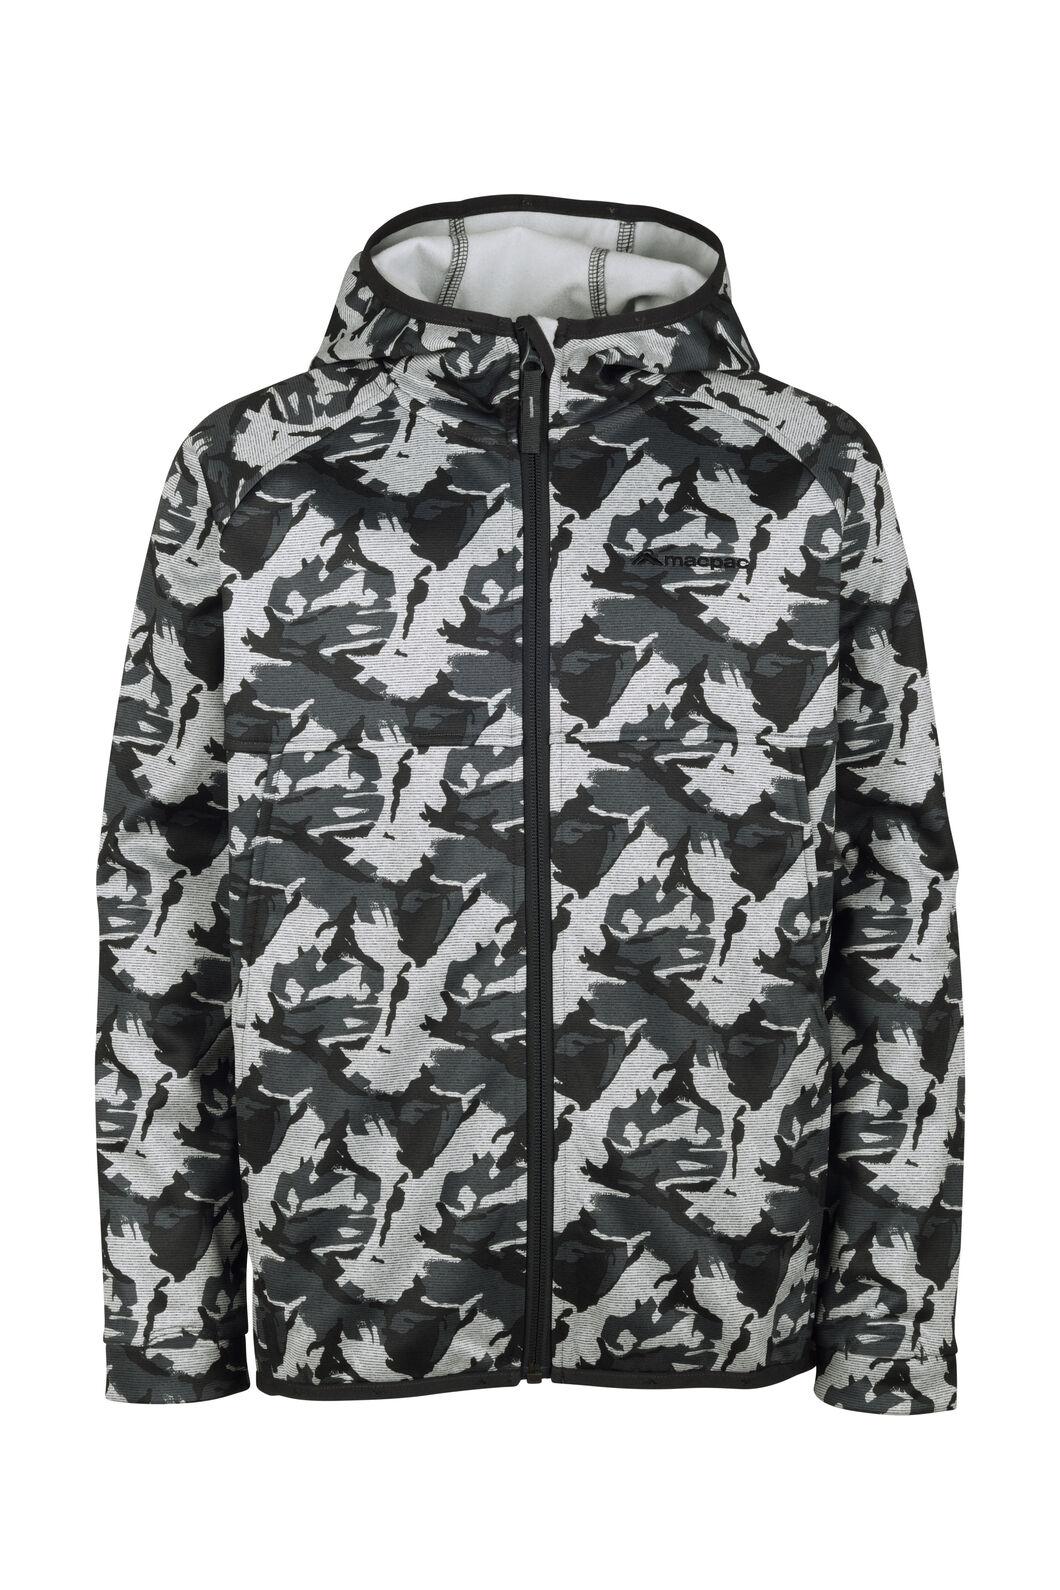 Macpac Kiwi Fleece Jacket - Kids', Grey Camo, hi-res